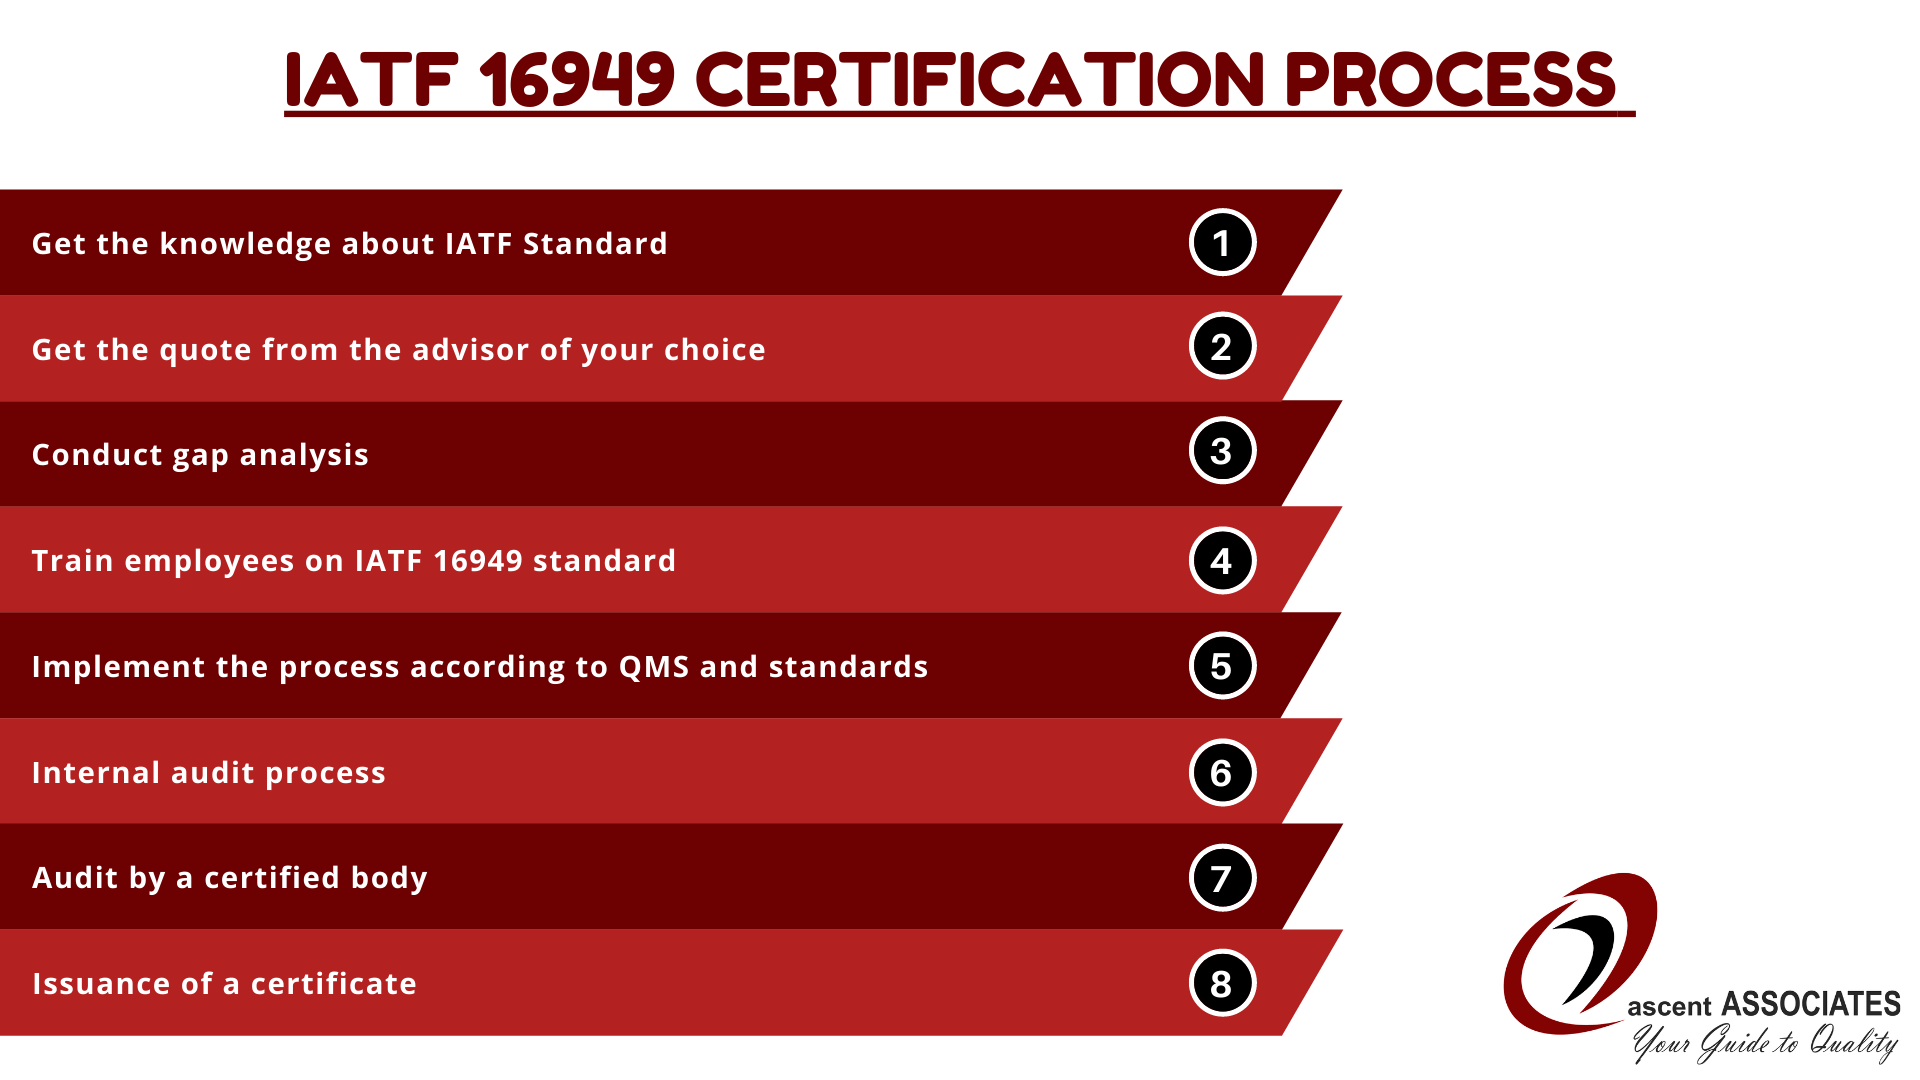 IATF 16949 Certification process